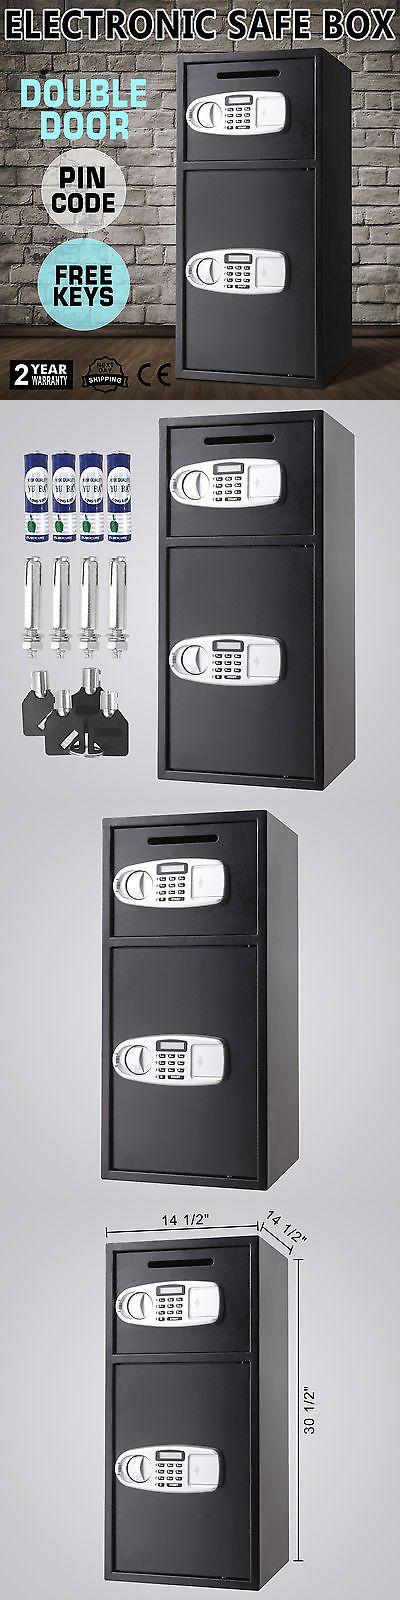 Safes 121836: Black Large 33 Digital Electronic Safe Box Keypad Lock Security Home Office -> BUY IT NOW ONLY: $109 on eBay!